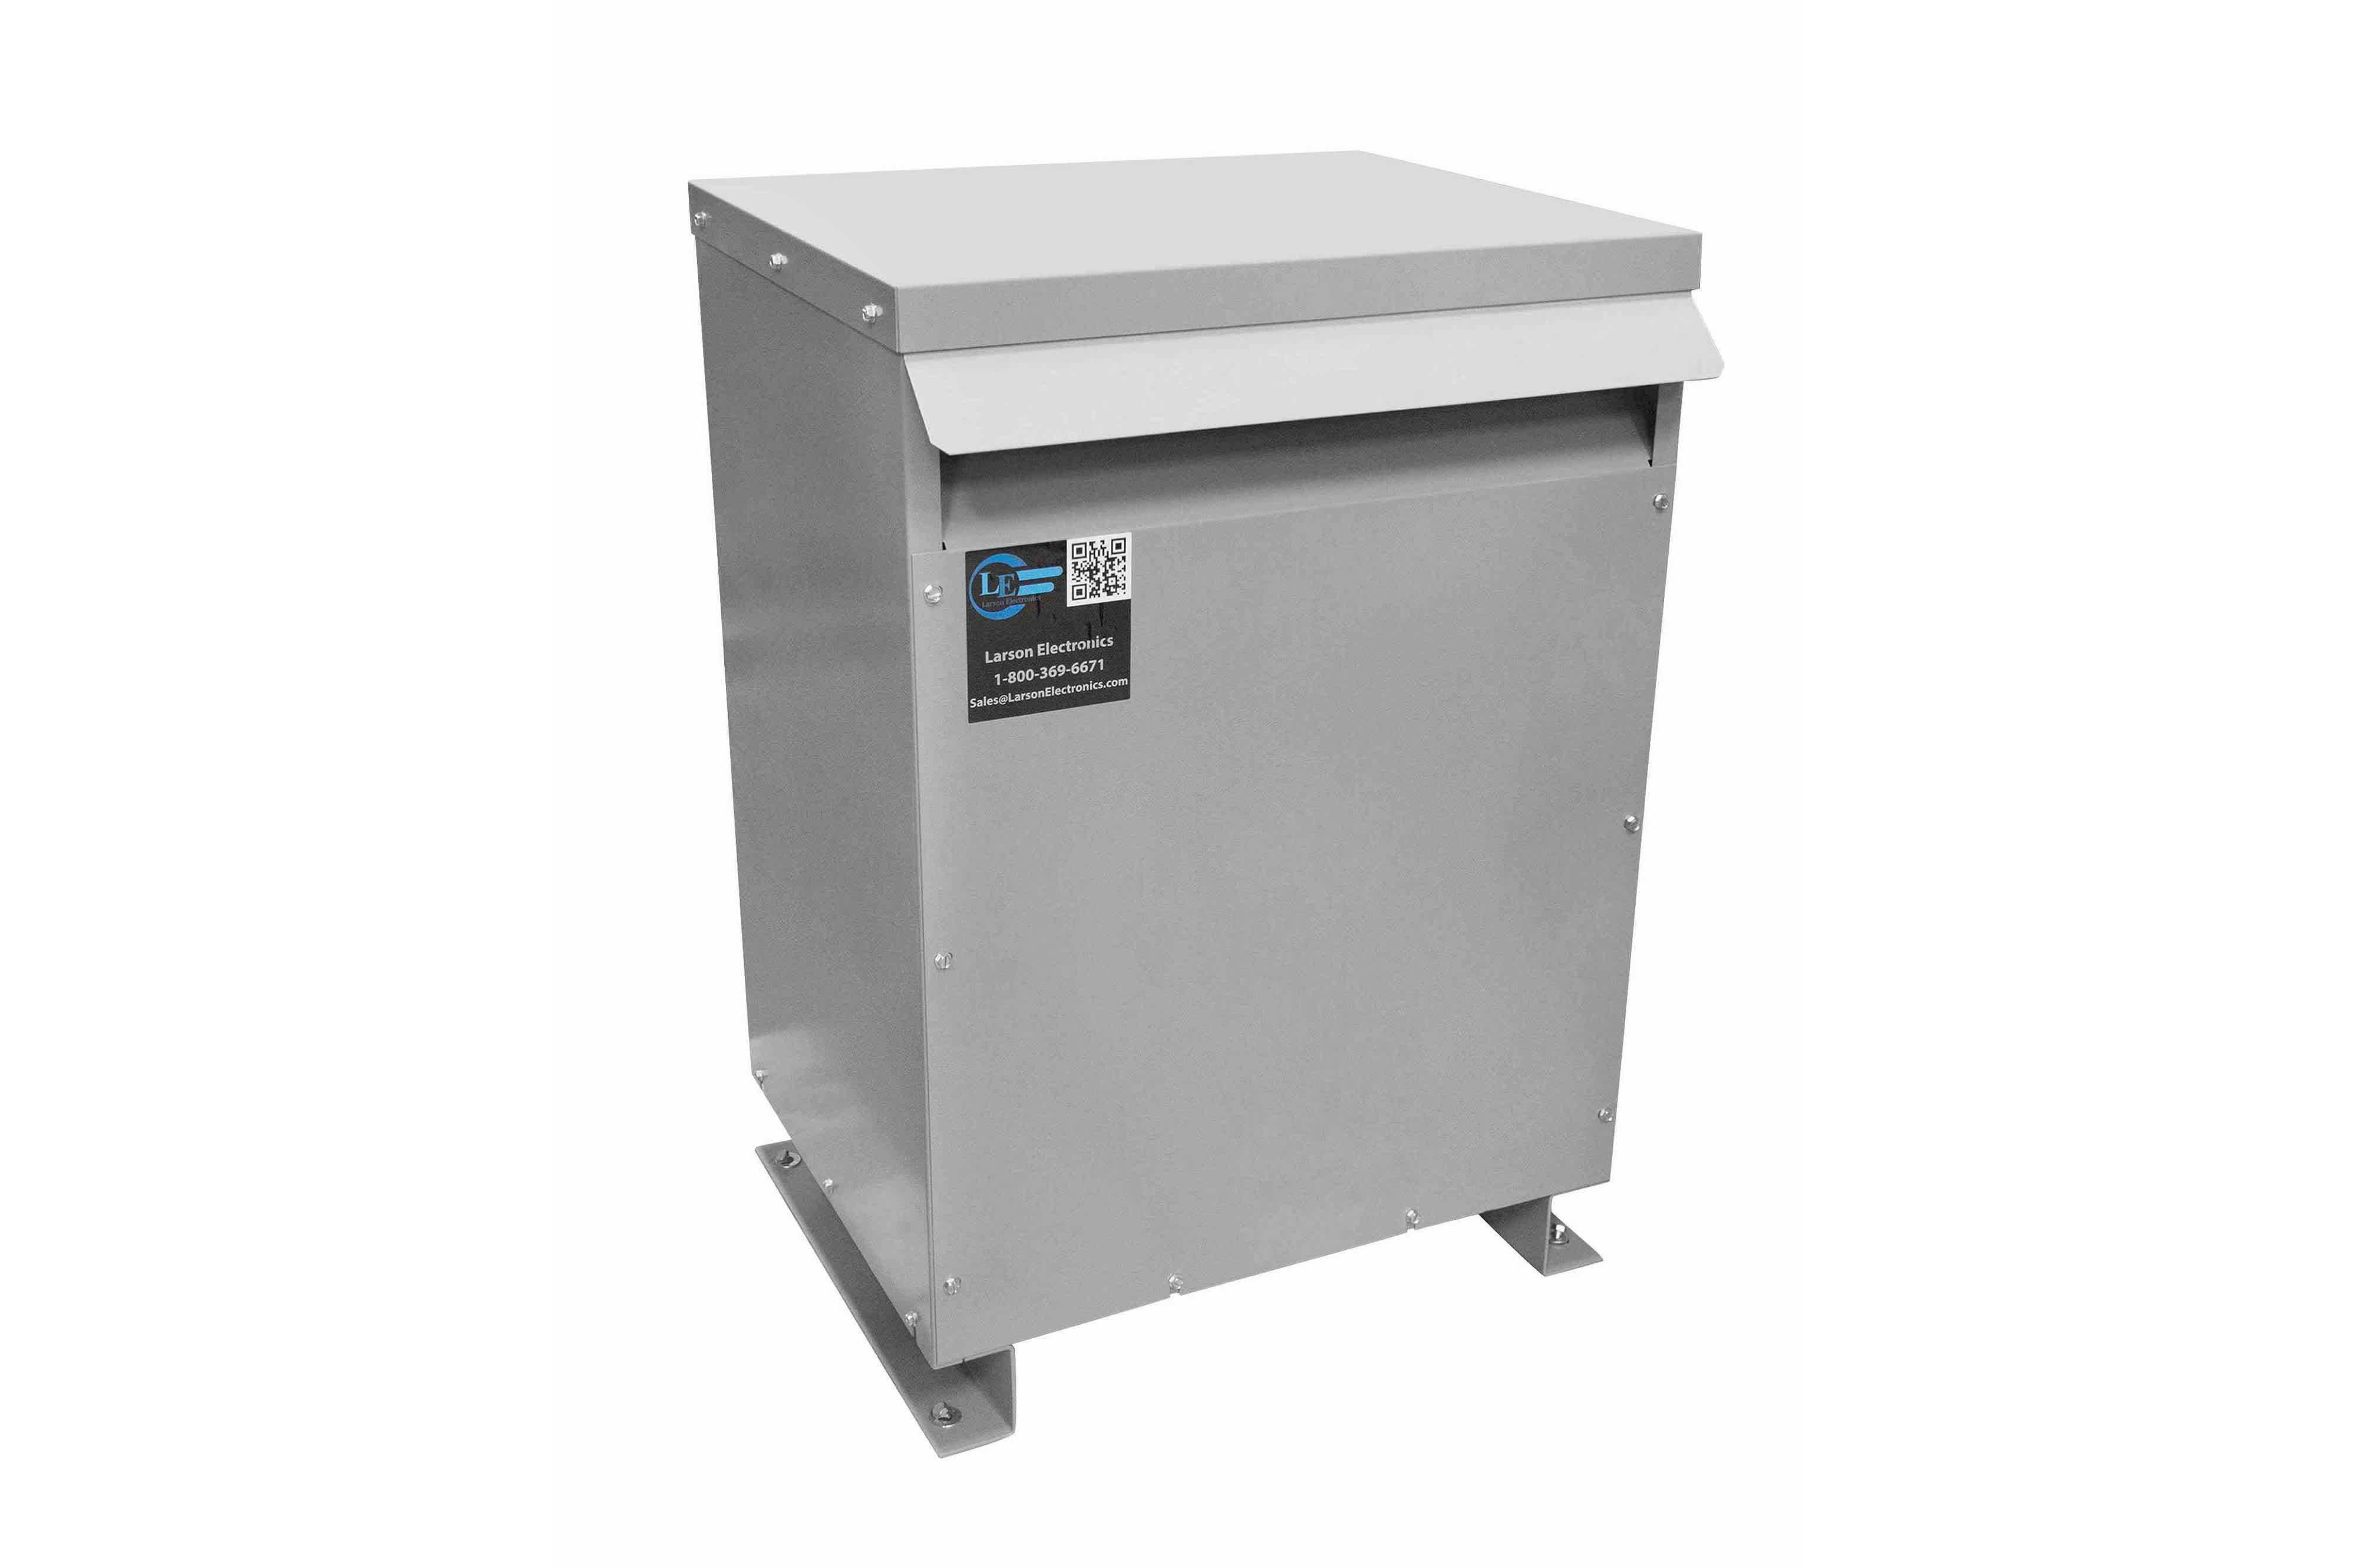 200 kVA 3PH Isolation Transformer, 575V Wye Primary, 480V Delta Secondary, N3R, Ventilated, 60 Hz